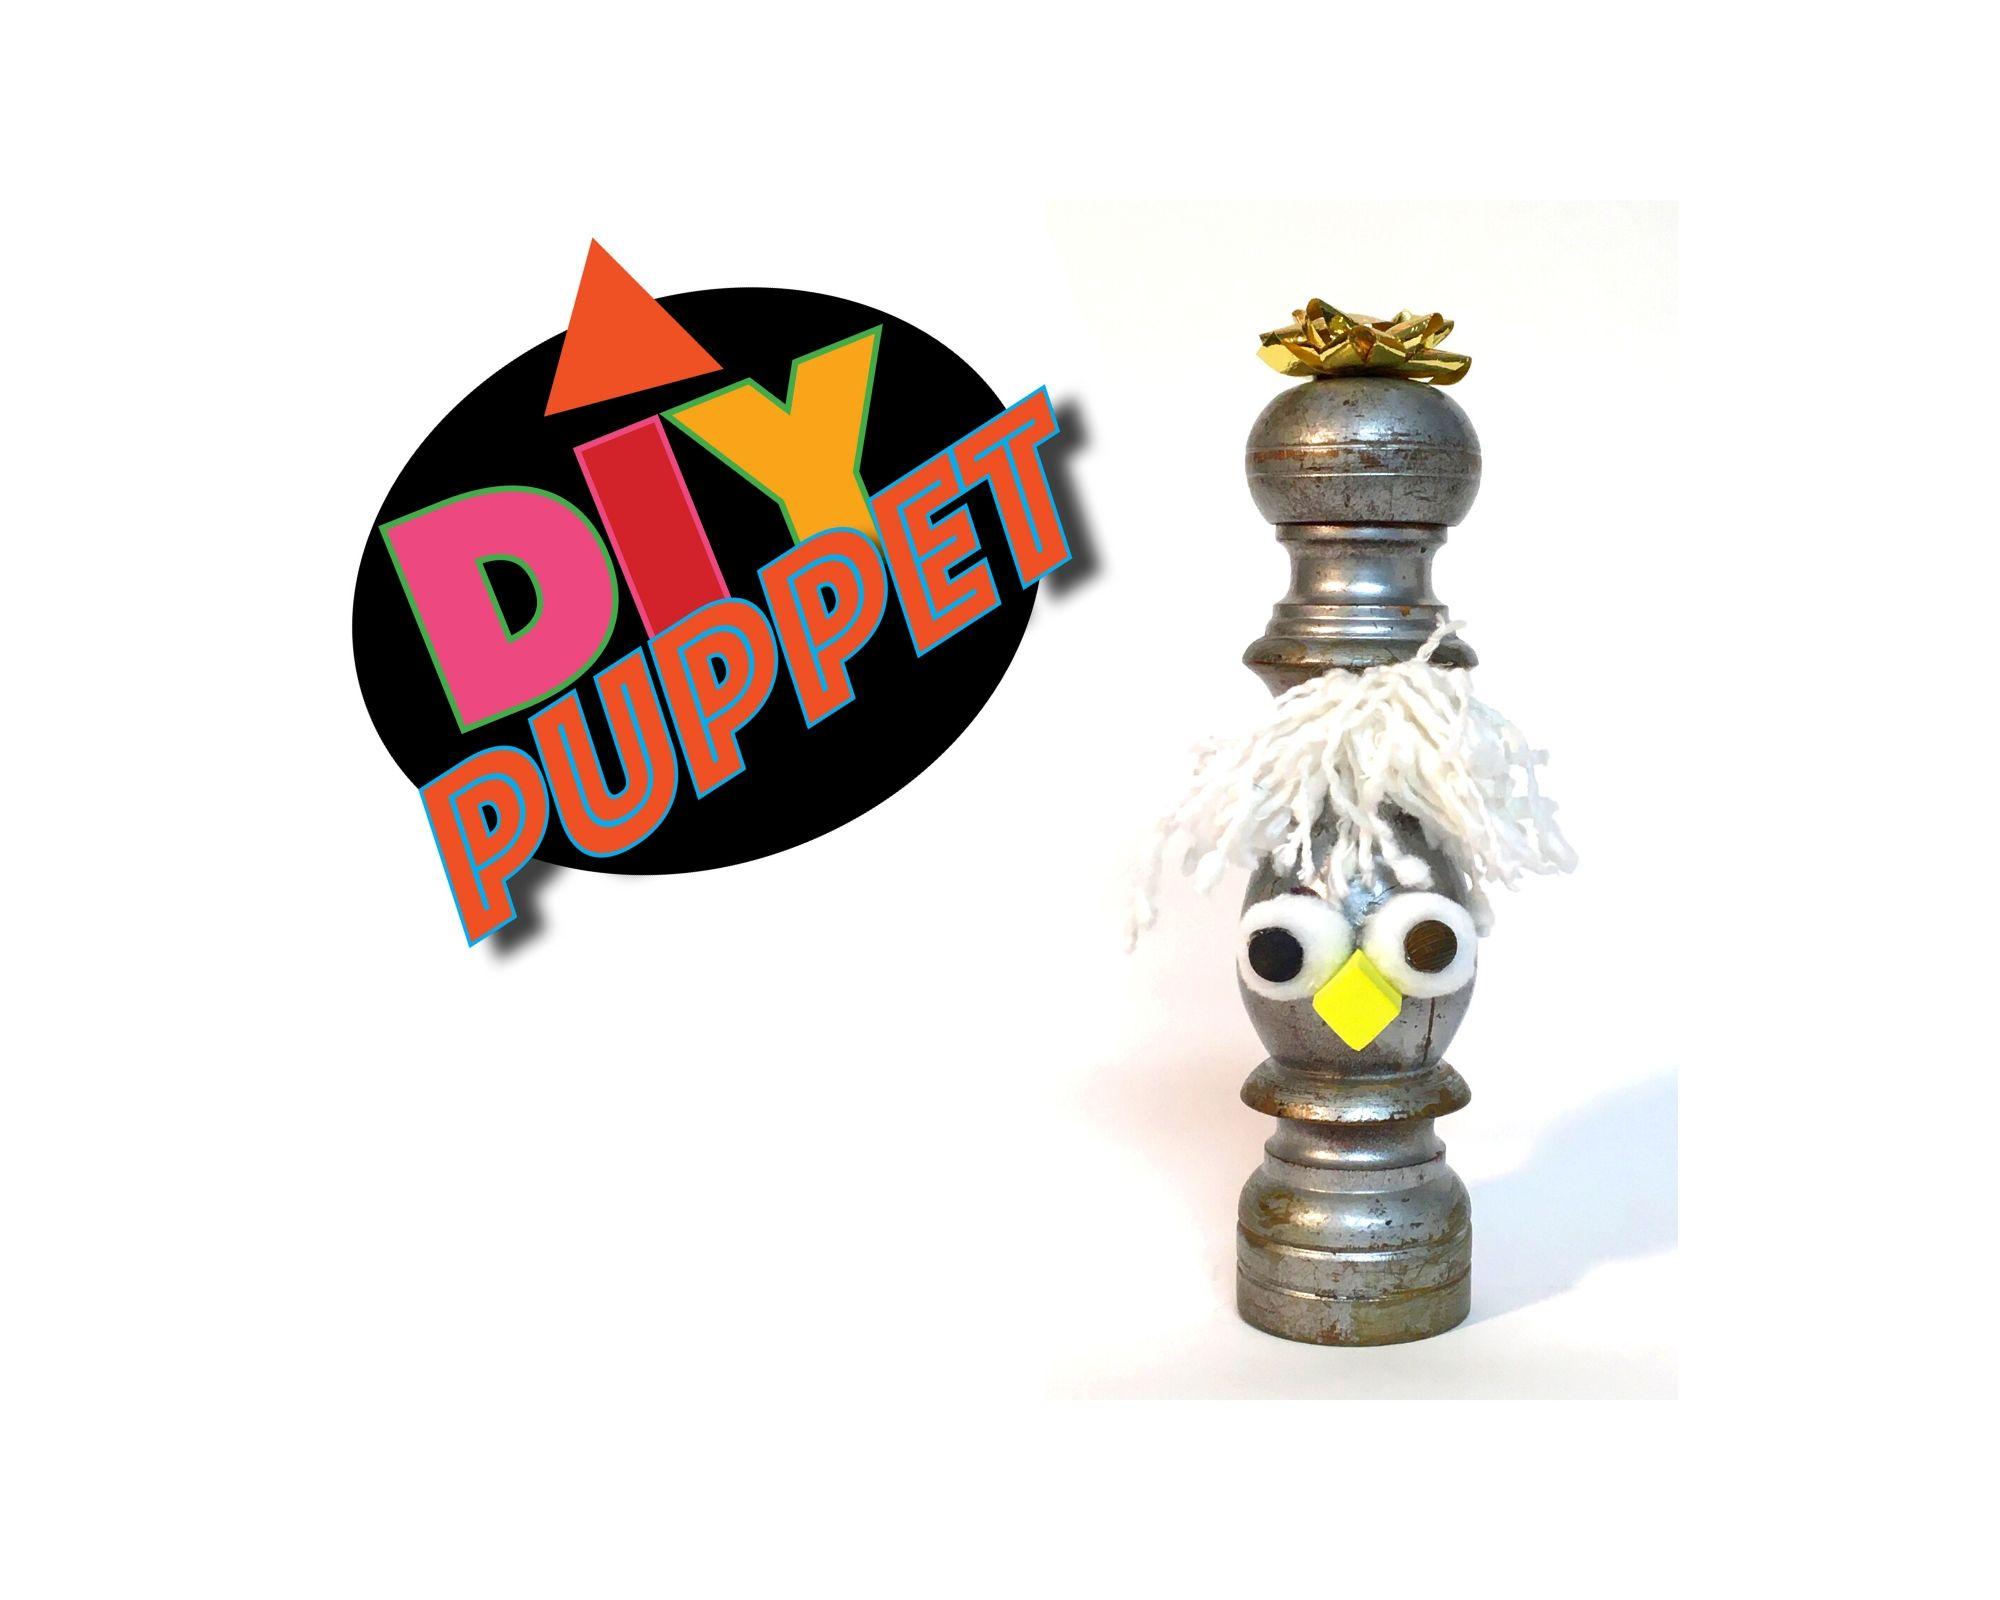 DIY Peppershaker